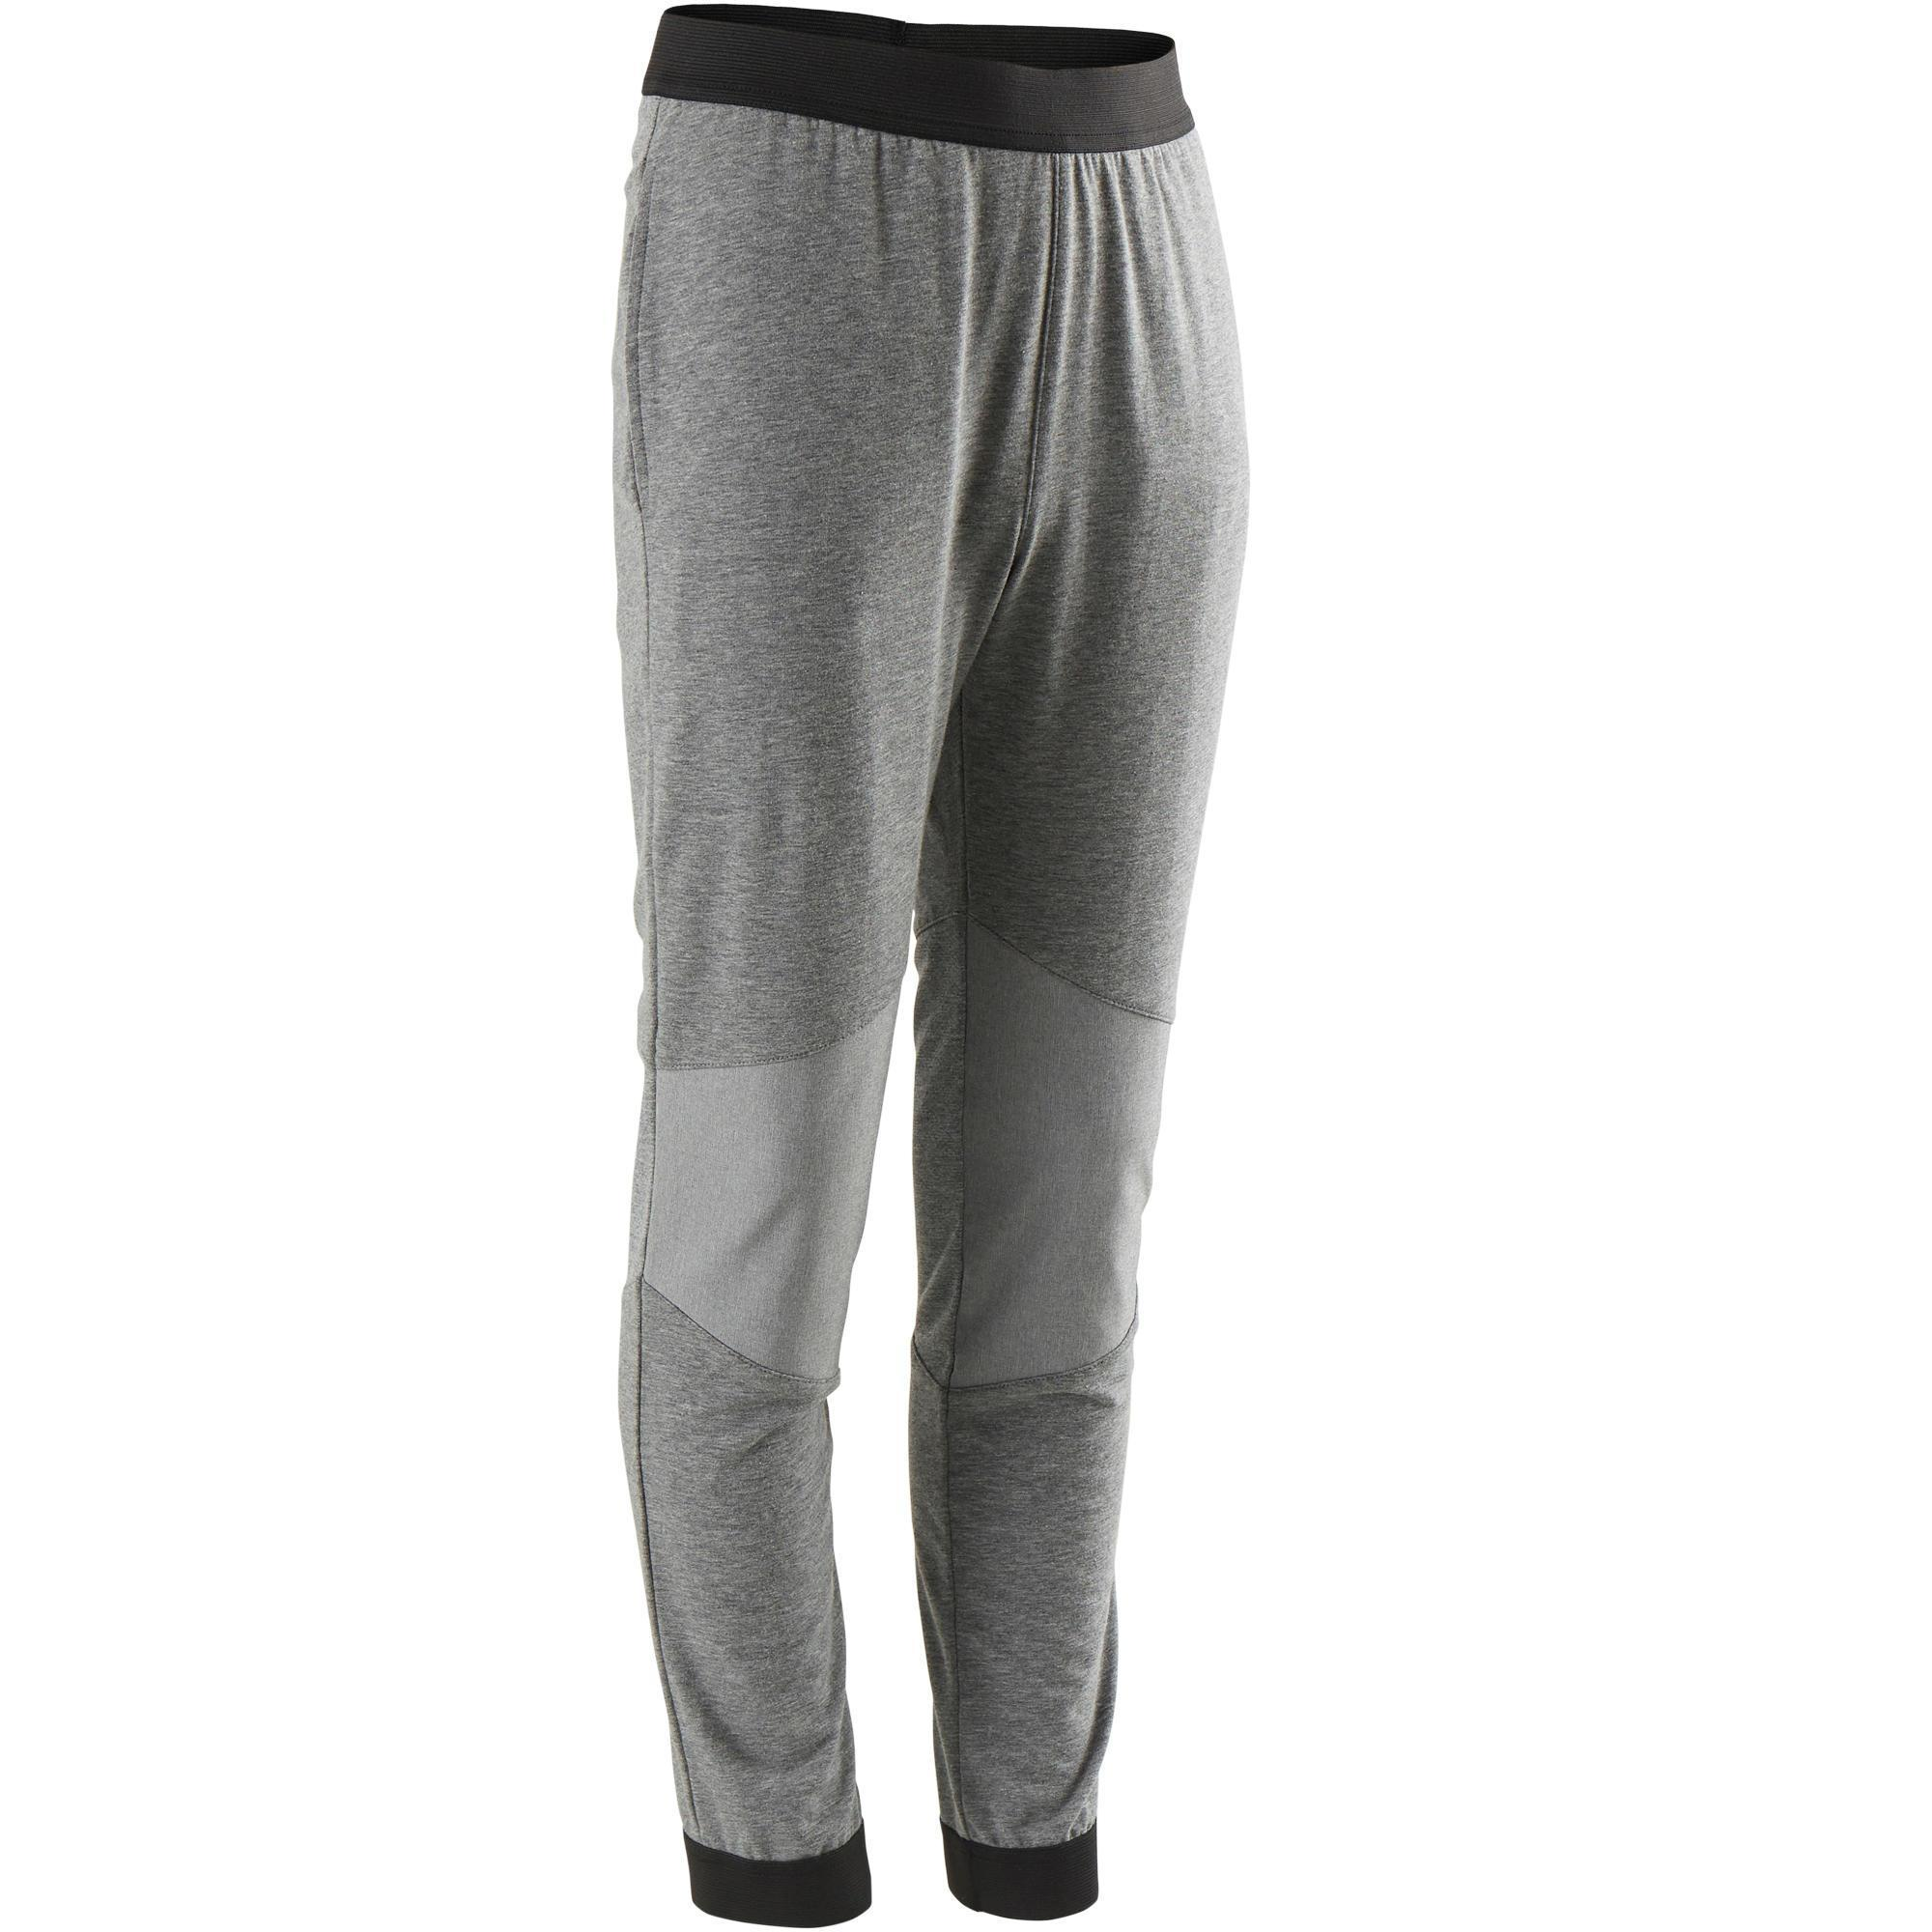 Pantalon coton respirant résistant slim léger 500 garçon gym enfant gris domyos